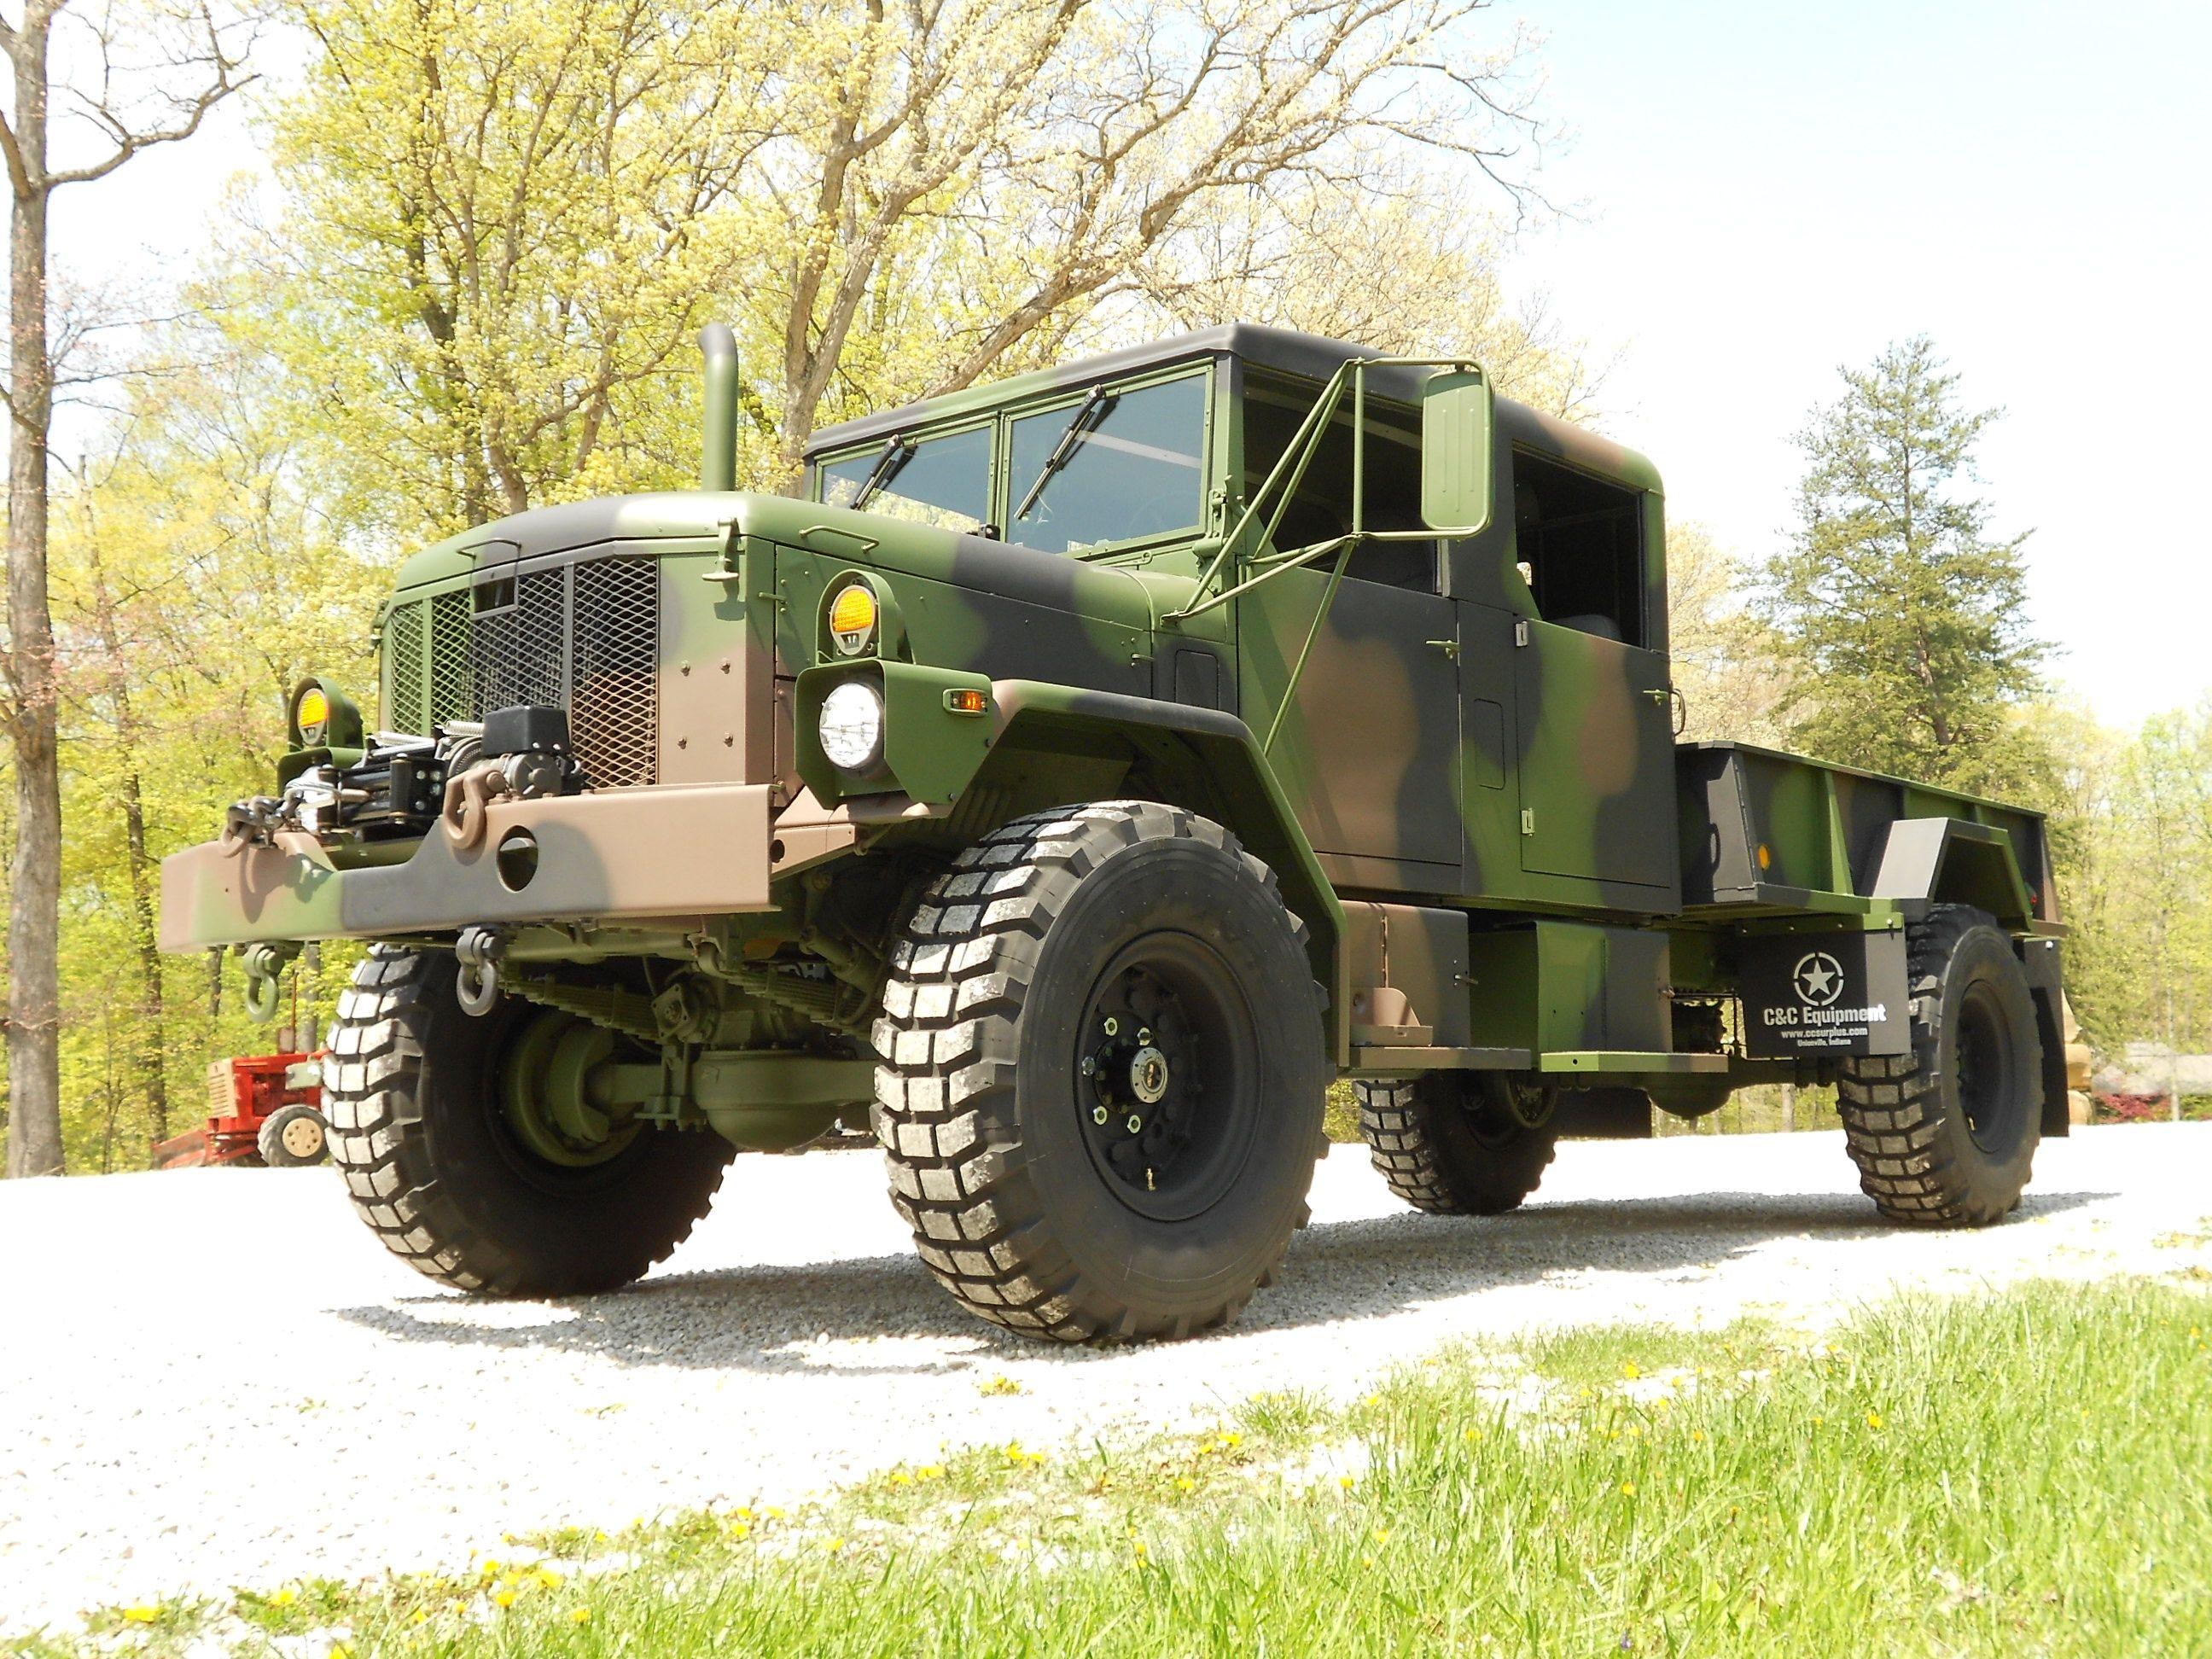 Similiar Bobbed 5 Ton Military Trucks Crew Cab Keywords